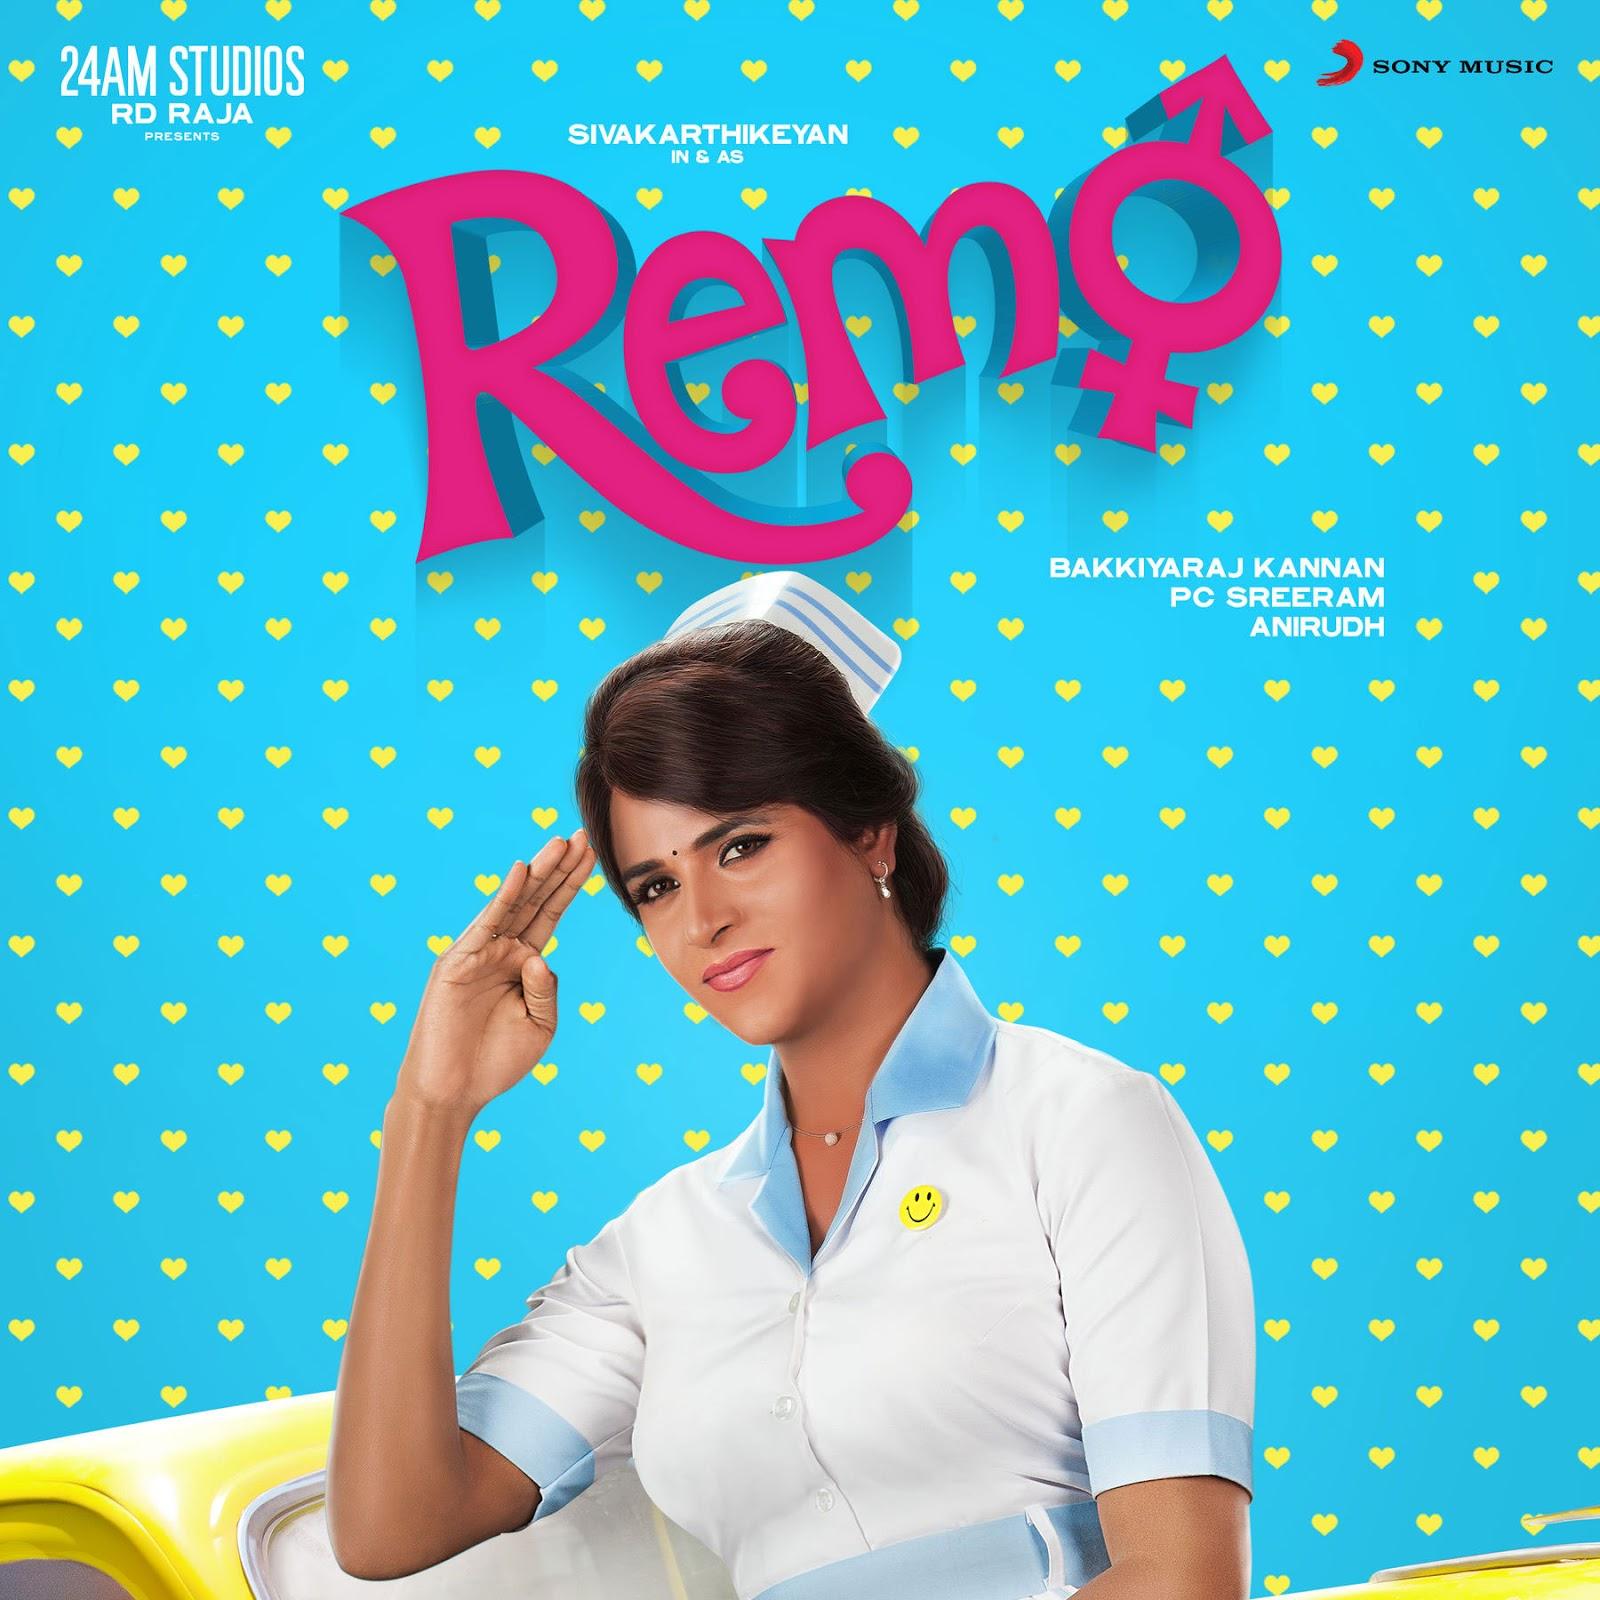 Remo-2016-Telugu-Original-CD-Front-Cover-Poster-wallpaper